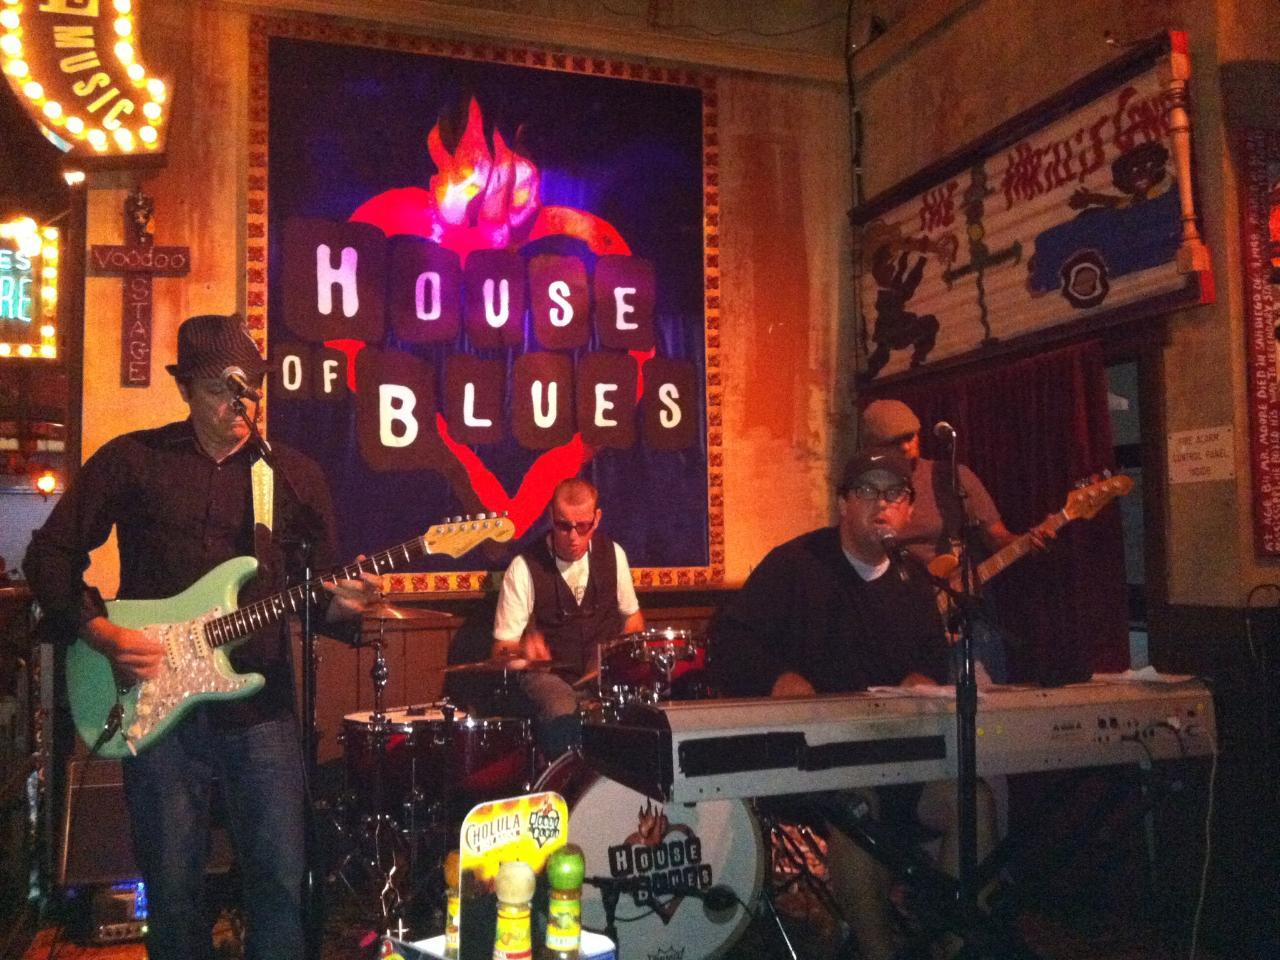 file:the bigfellas, house of blues, 2011 - wikipedia